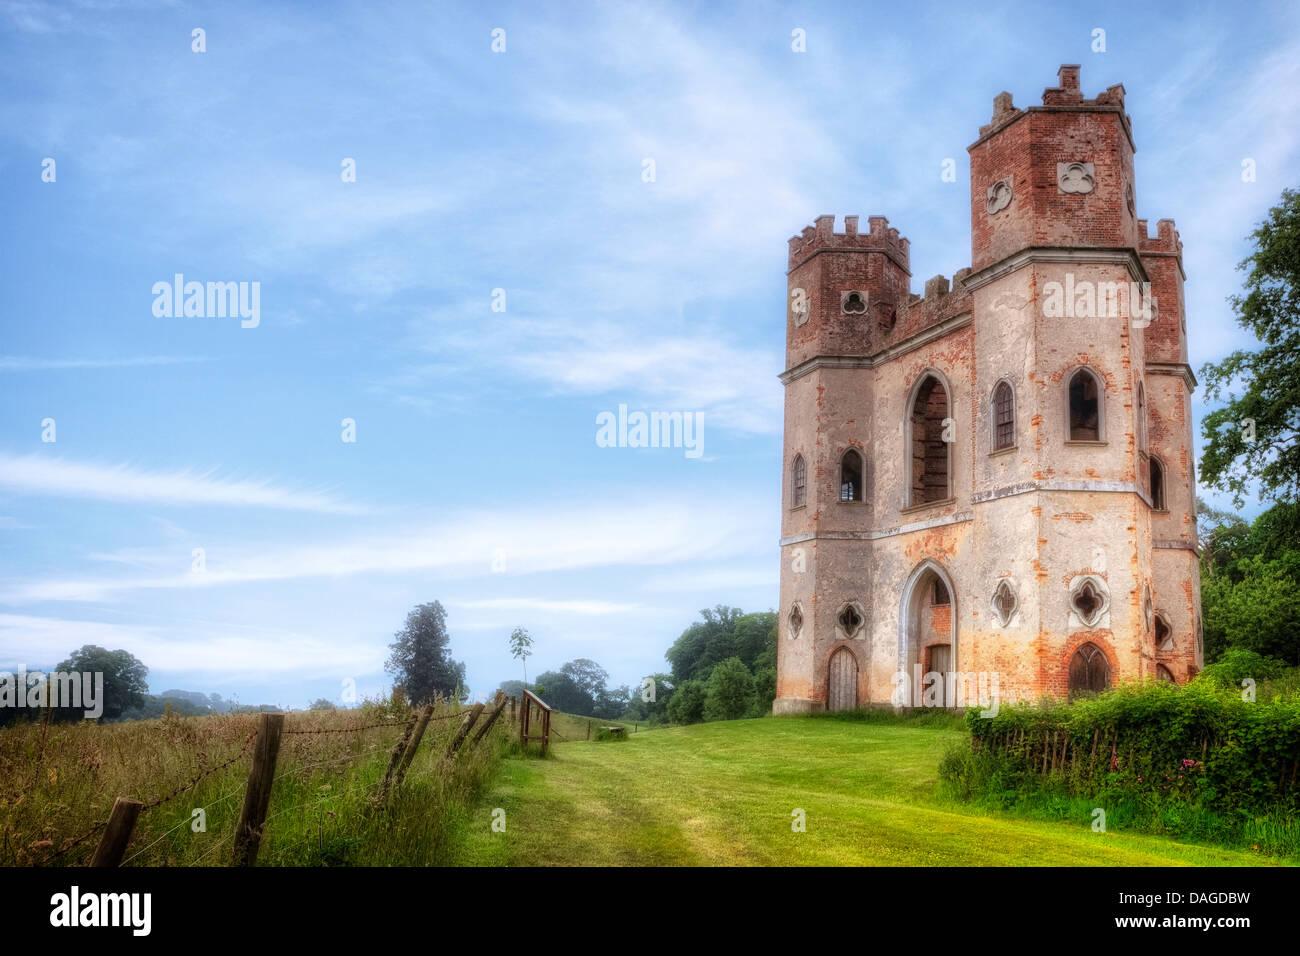 Powderham Castle, Belvedere Tower, Devon, United Kingdom - Stock Image